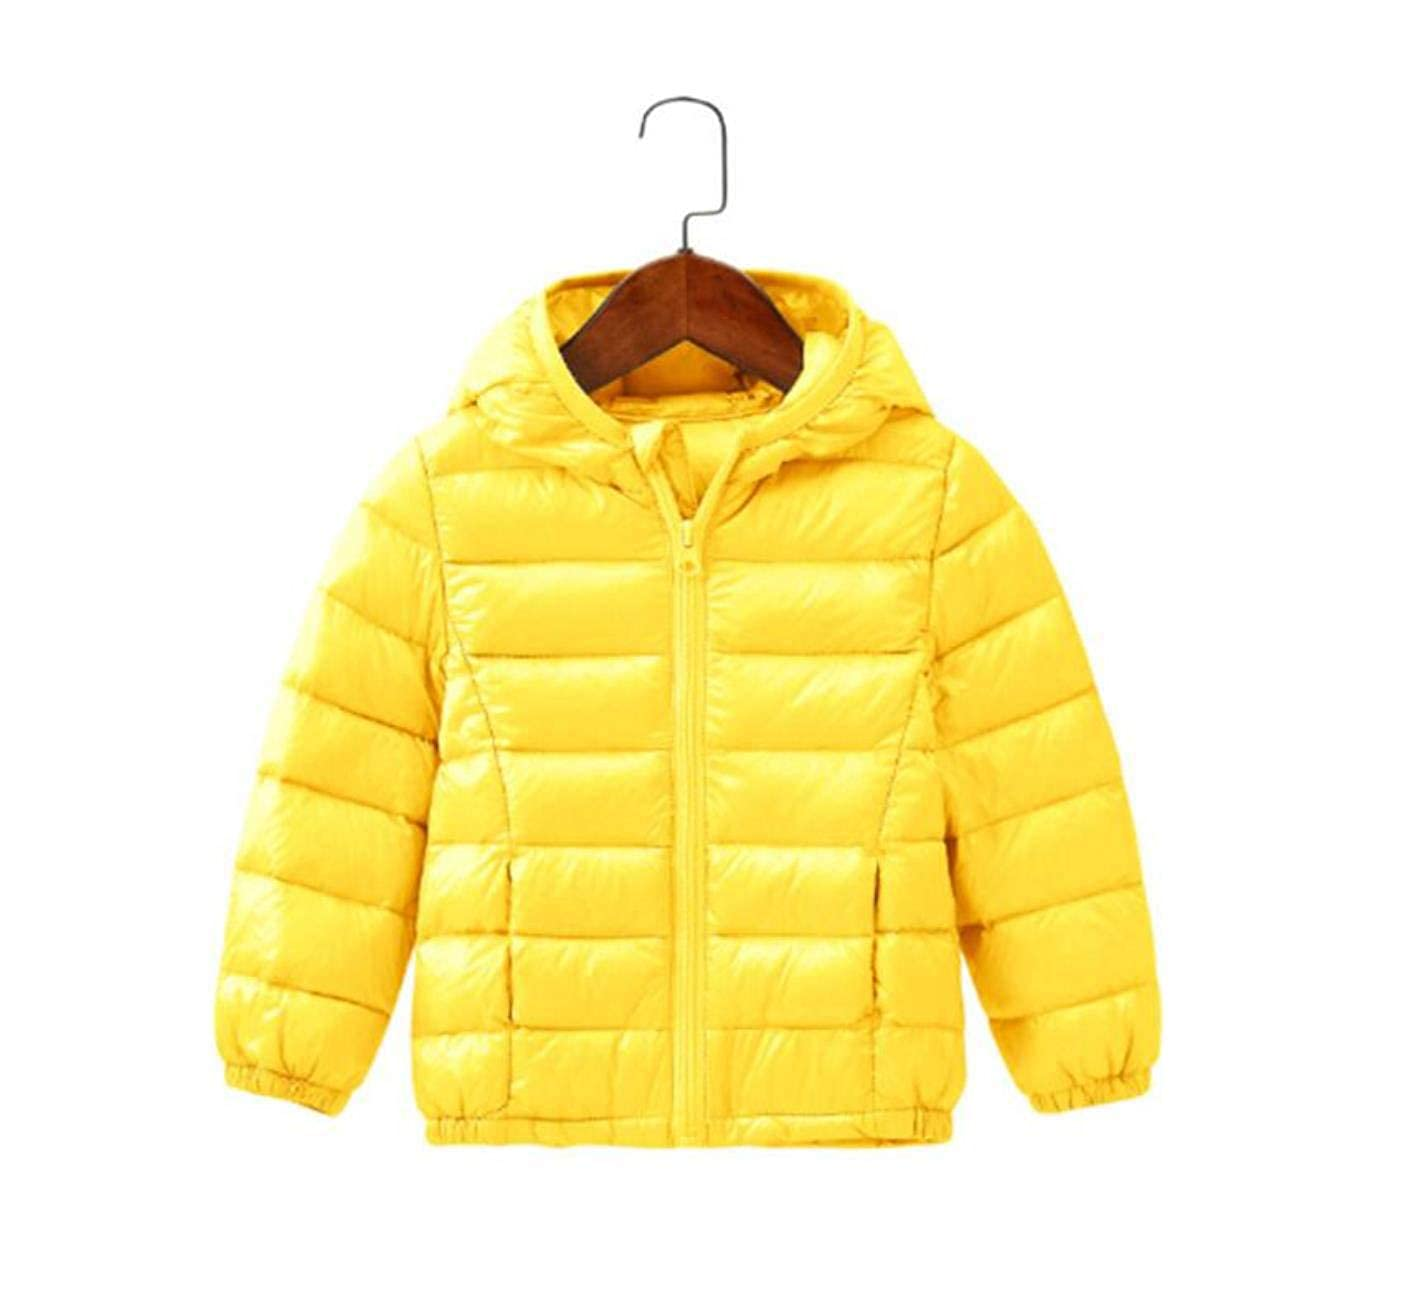 cec2dd105 Amazon.com: Girls Boys Parka Light Jacket Hood Cotton Down Coat ...